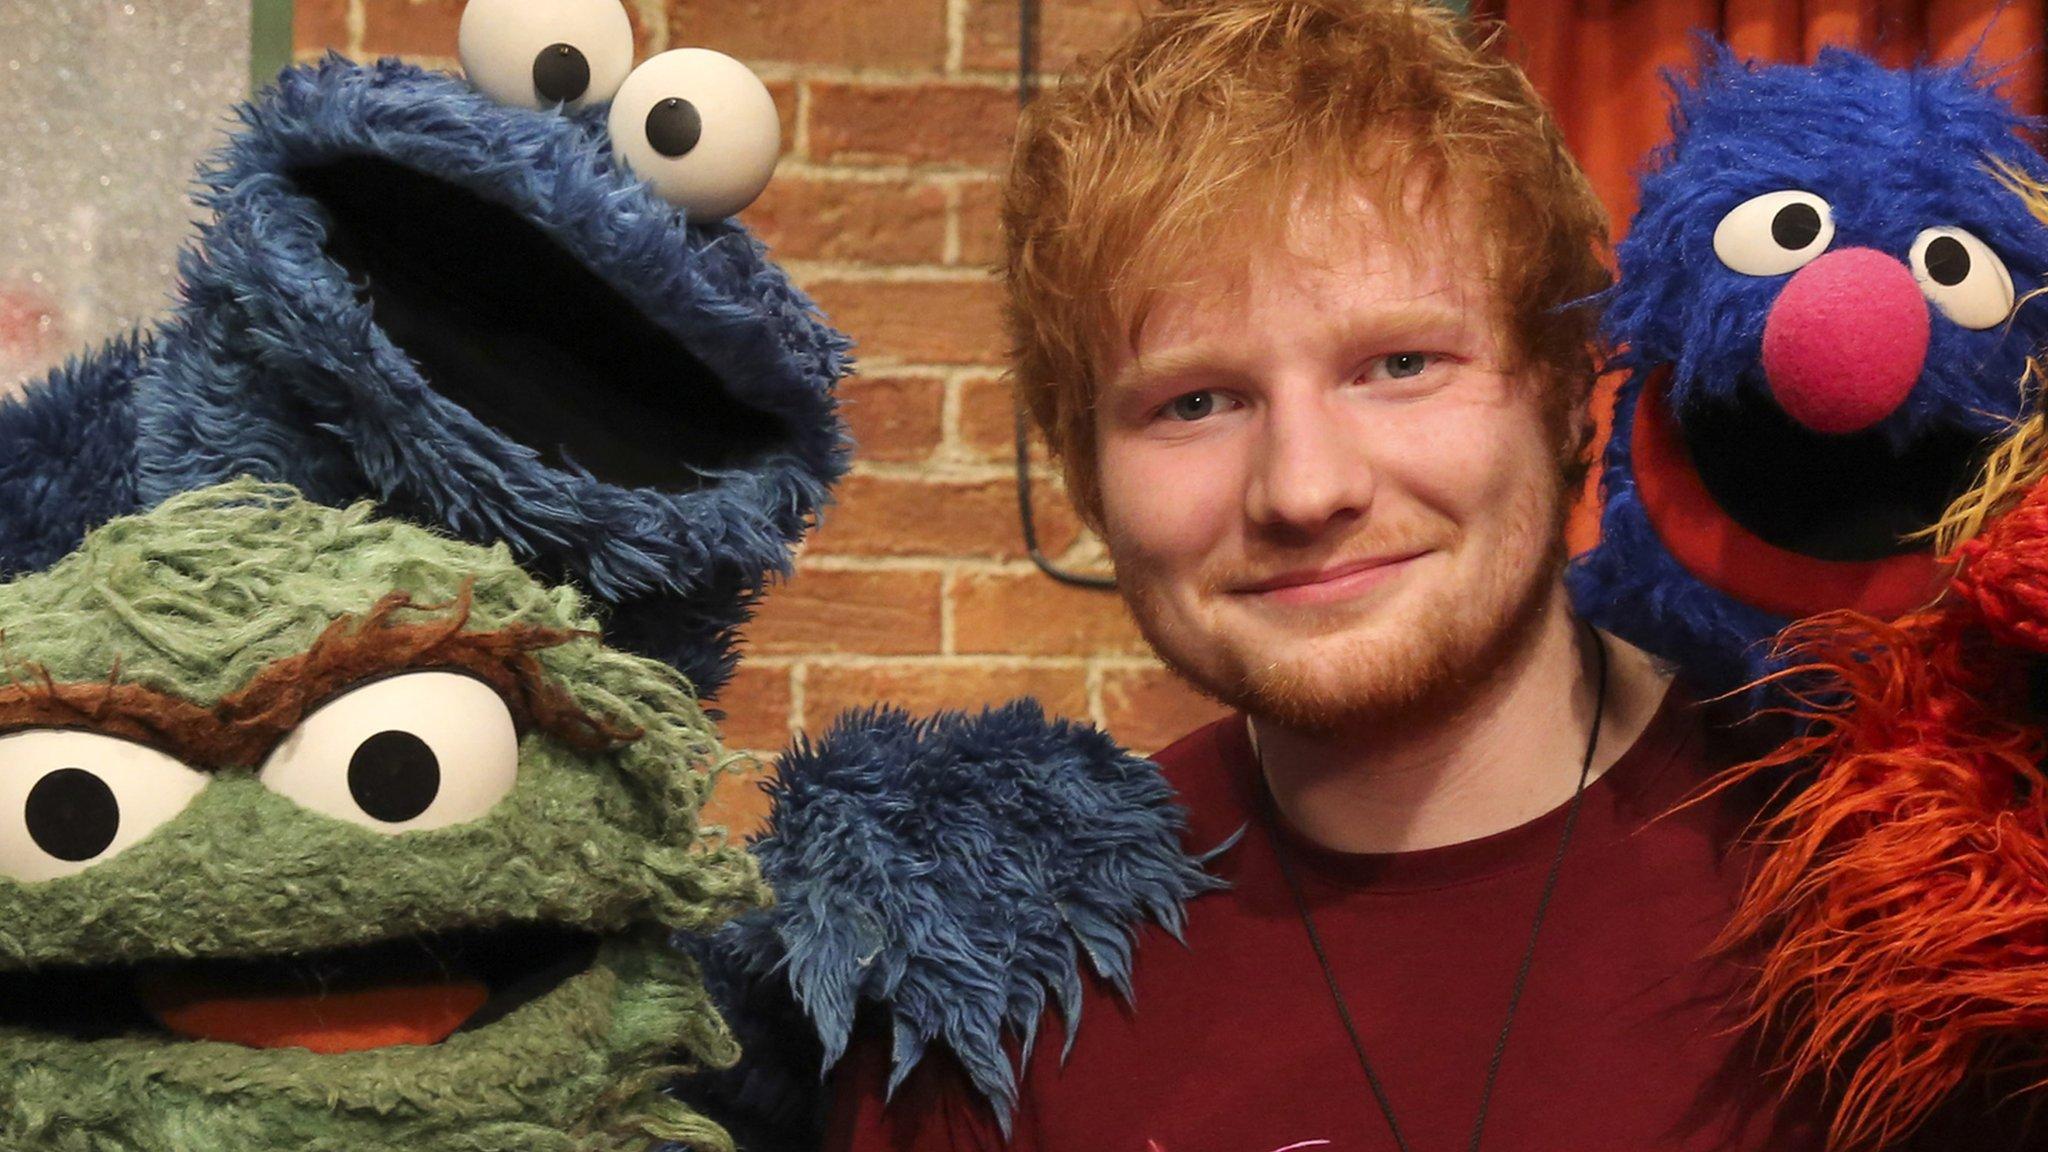 Ed sheeran sings with the sesame street gang bbc newsbeat